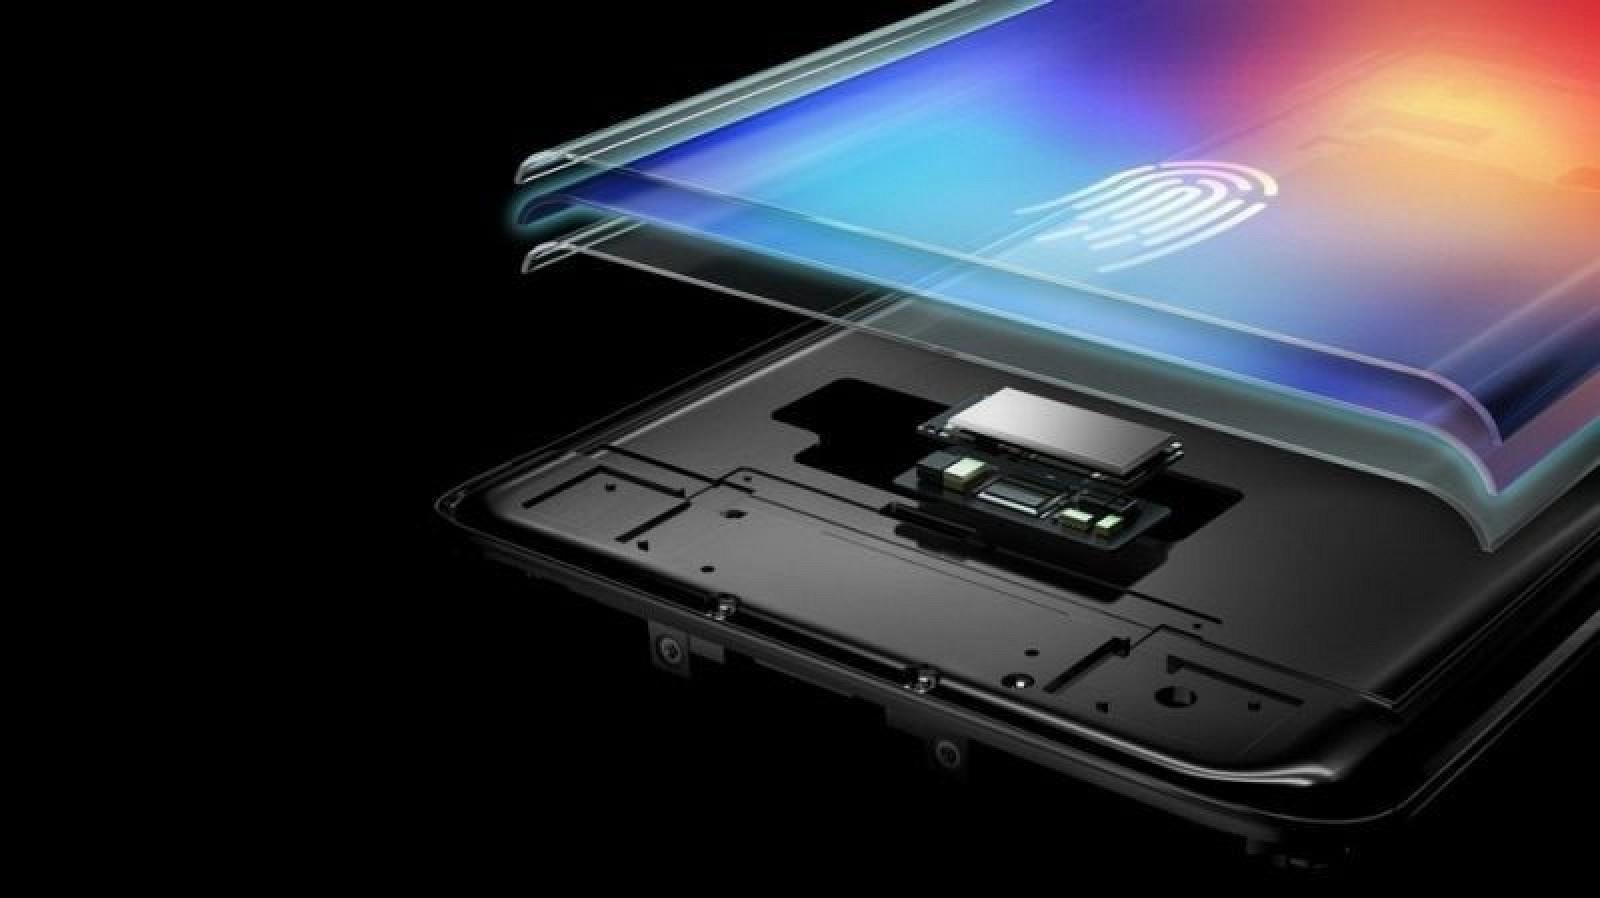 Vivo Unveils Screen-Embedded Fingerprint Sensor Technology at MWC2017 Shanghai